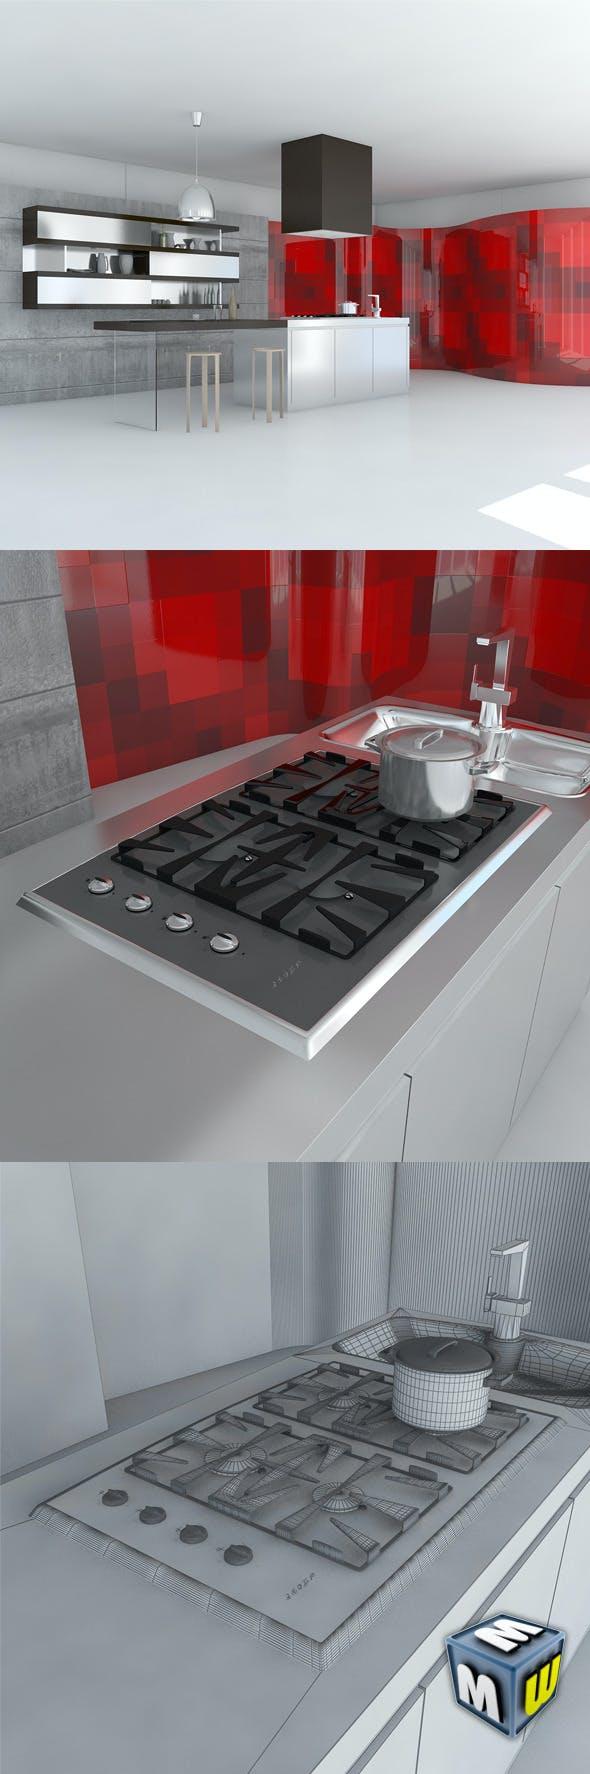 Kitchen Minimal Scene - 3DOcean Item for Sale